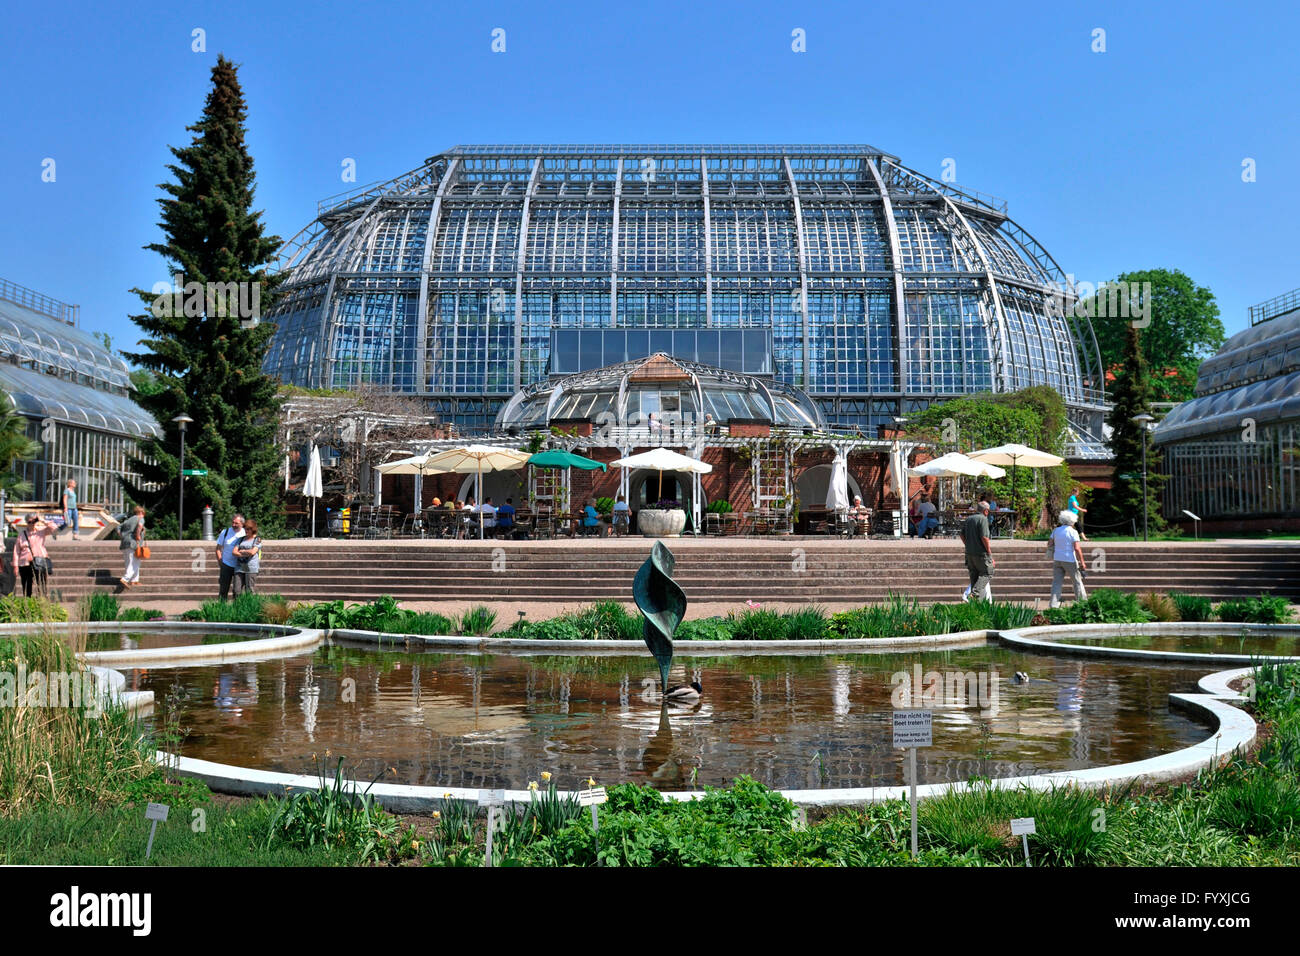 Superieur Great Greenhouse, Grosses Tropenhaus, Botanical Garden, Dahlem, Berlin,  Germany